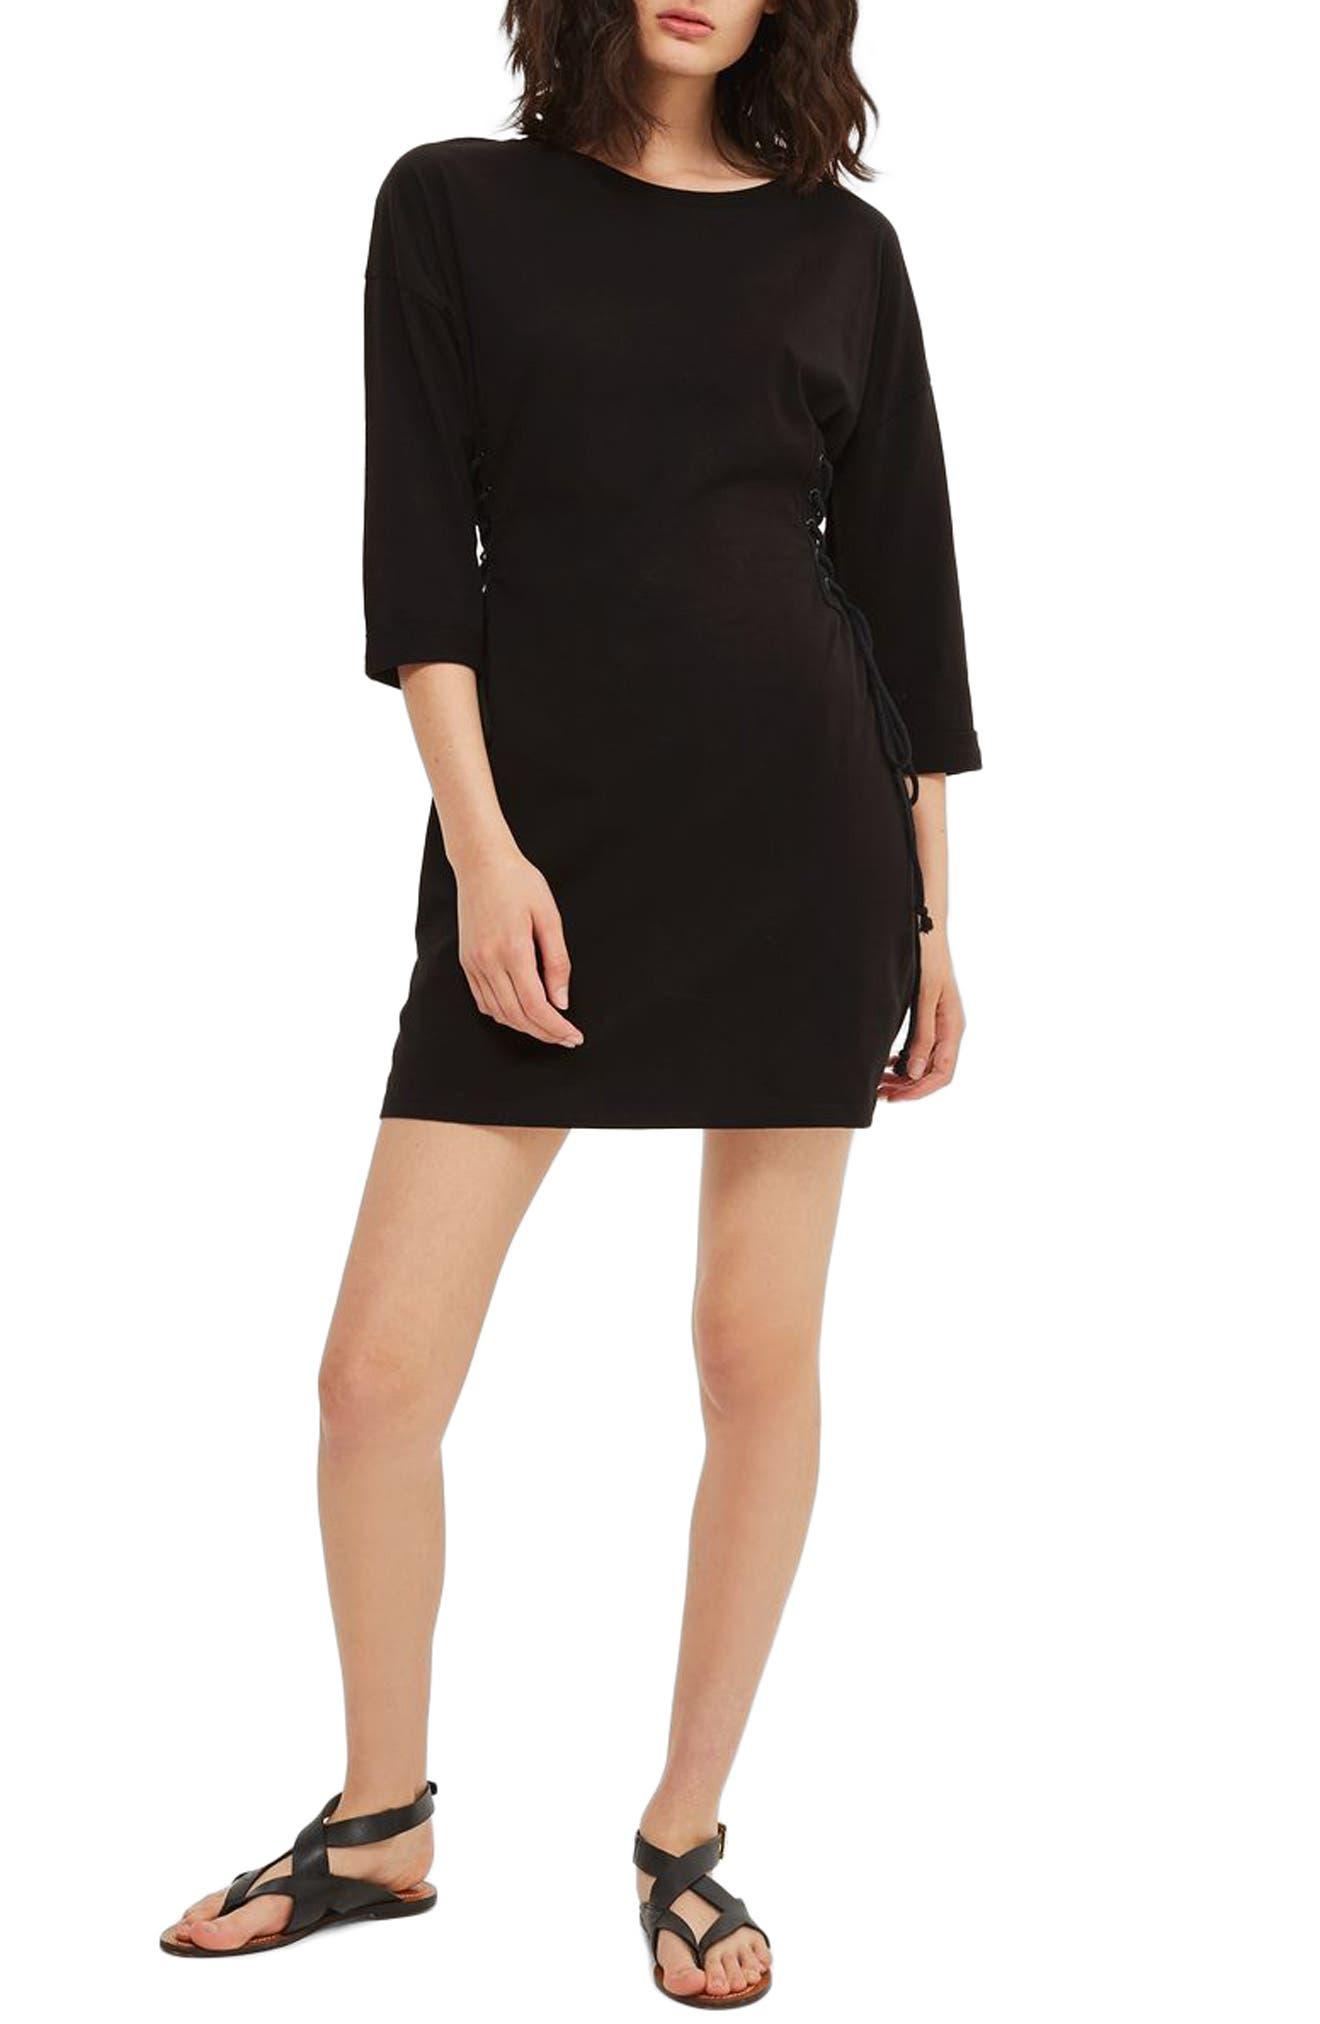 Main Image - Topshop Lace-Up Side Tunic Dress